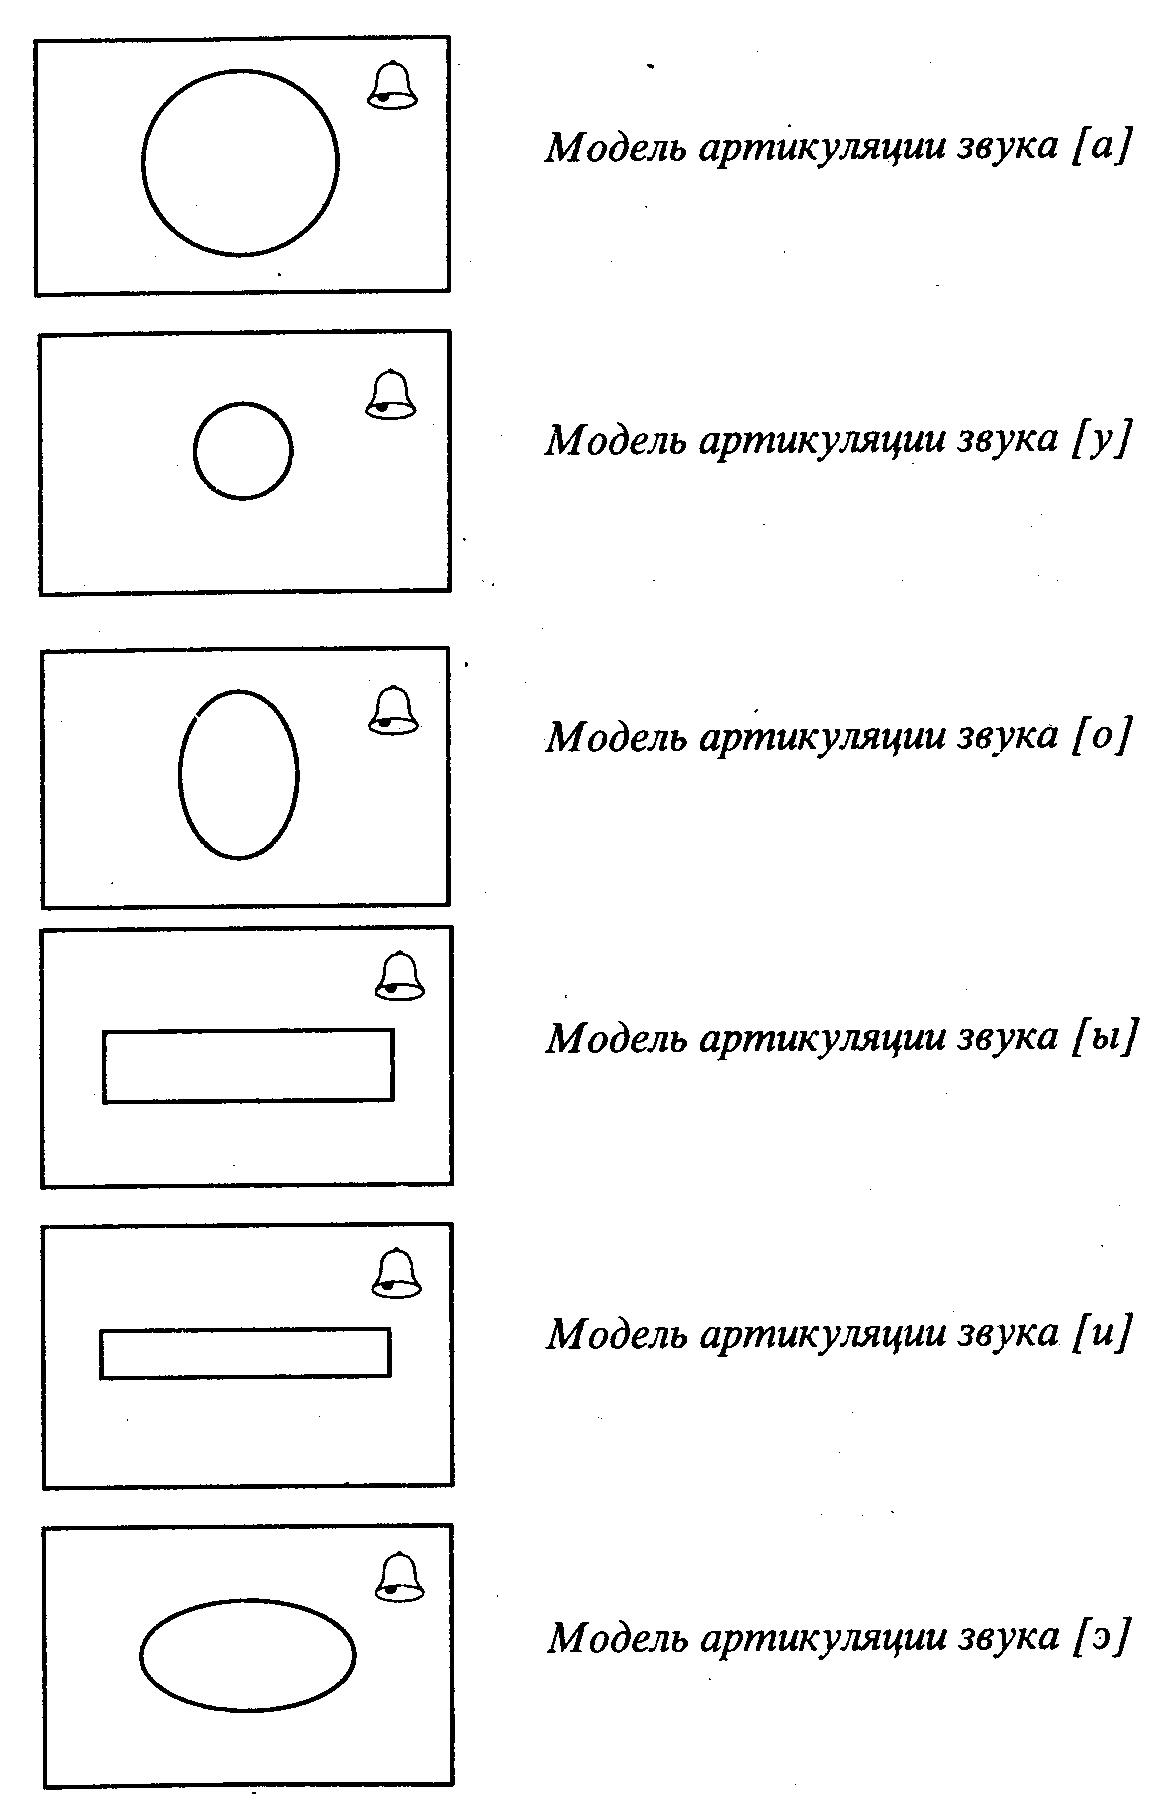 модель артикуляции звуков картинки